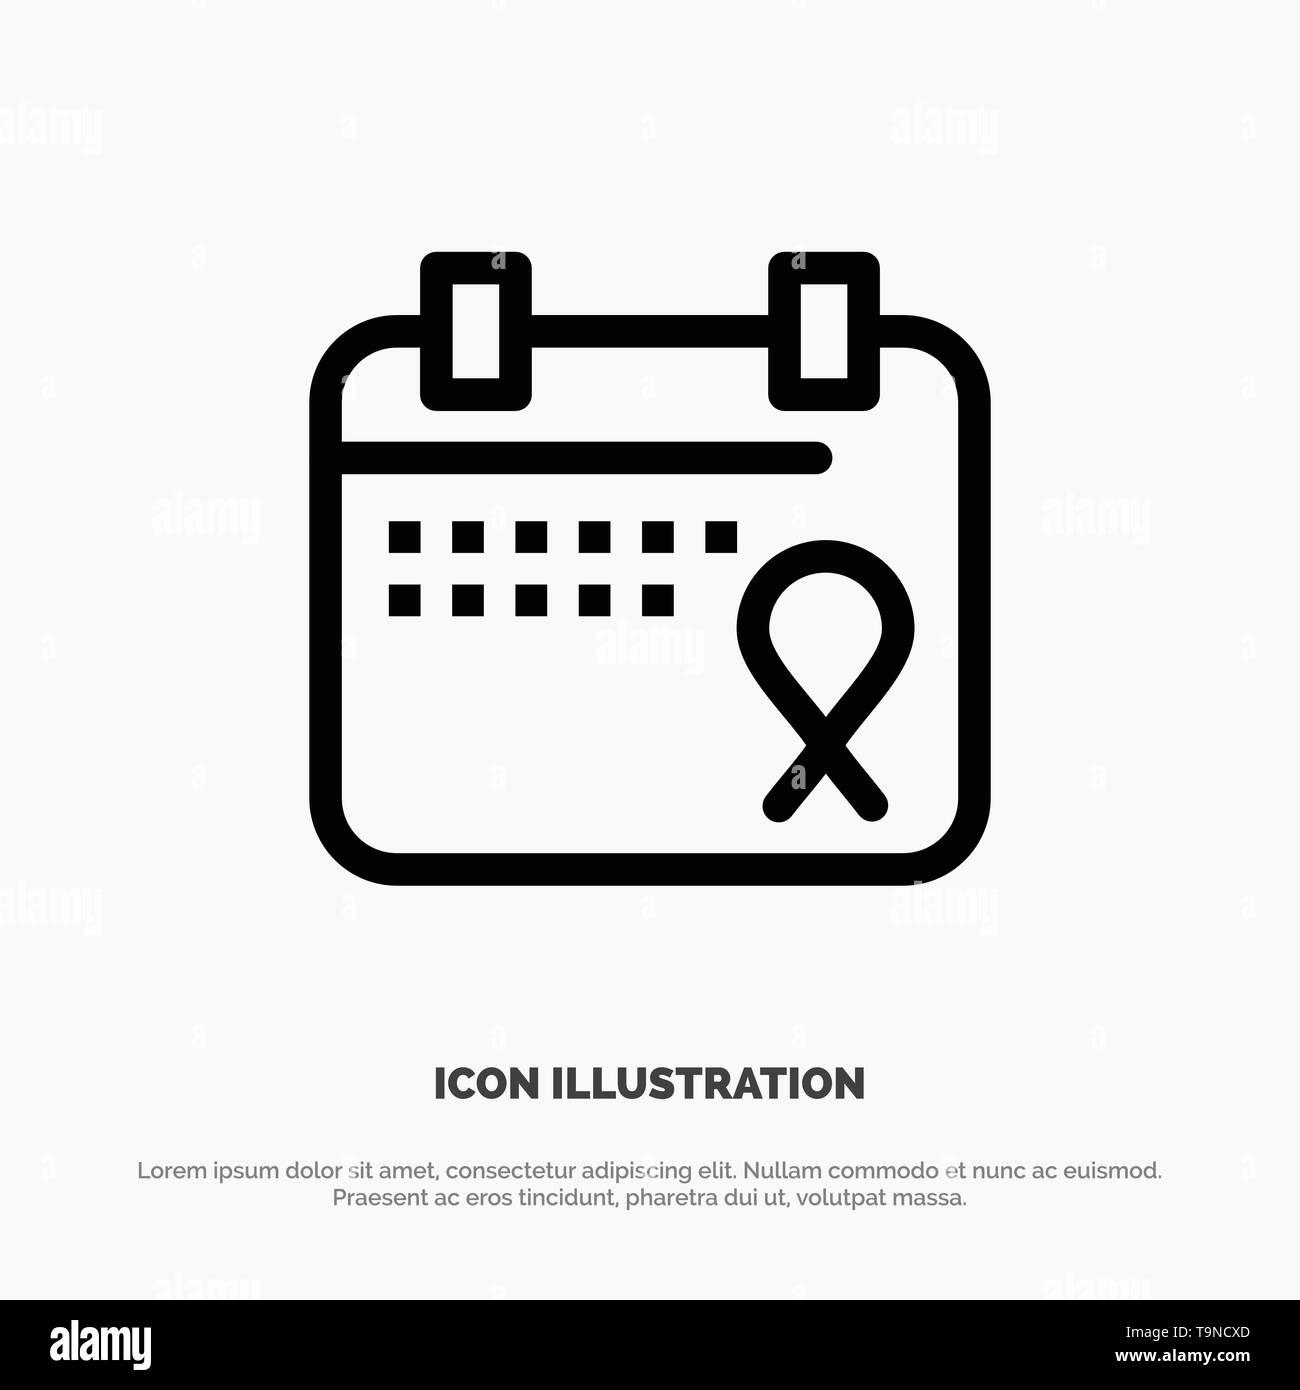 Calendar, Love, Operation, Date Vector Line Icon - Stock Image